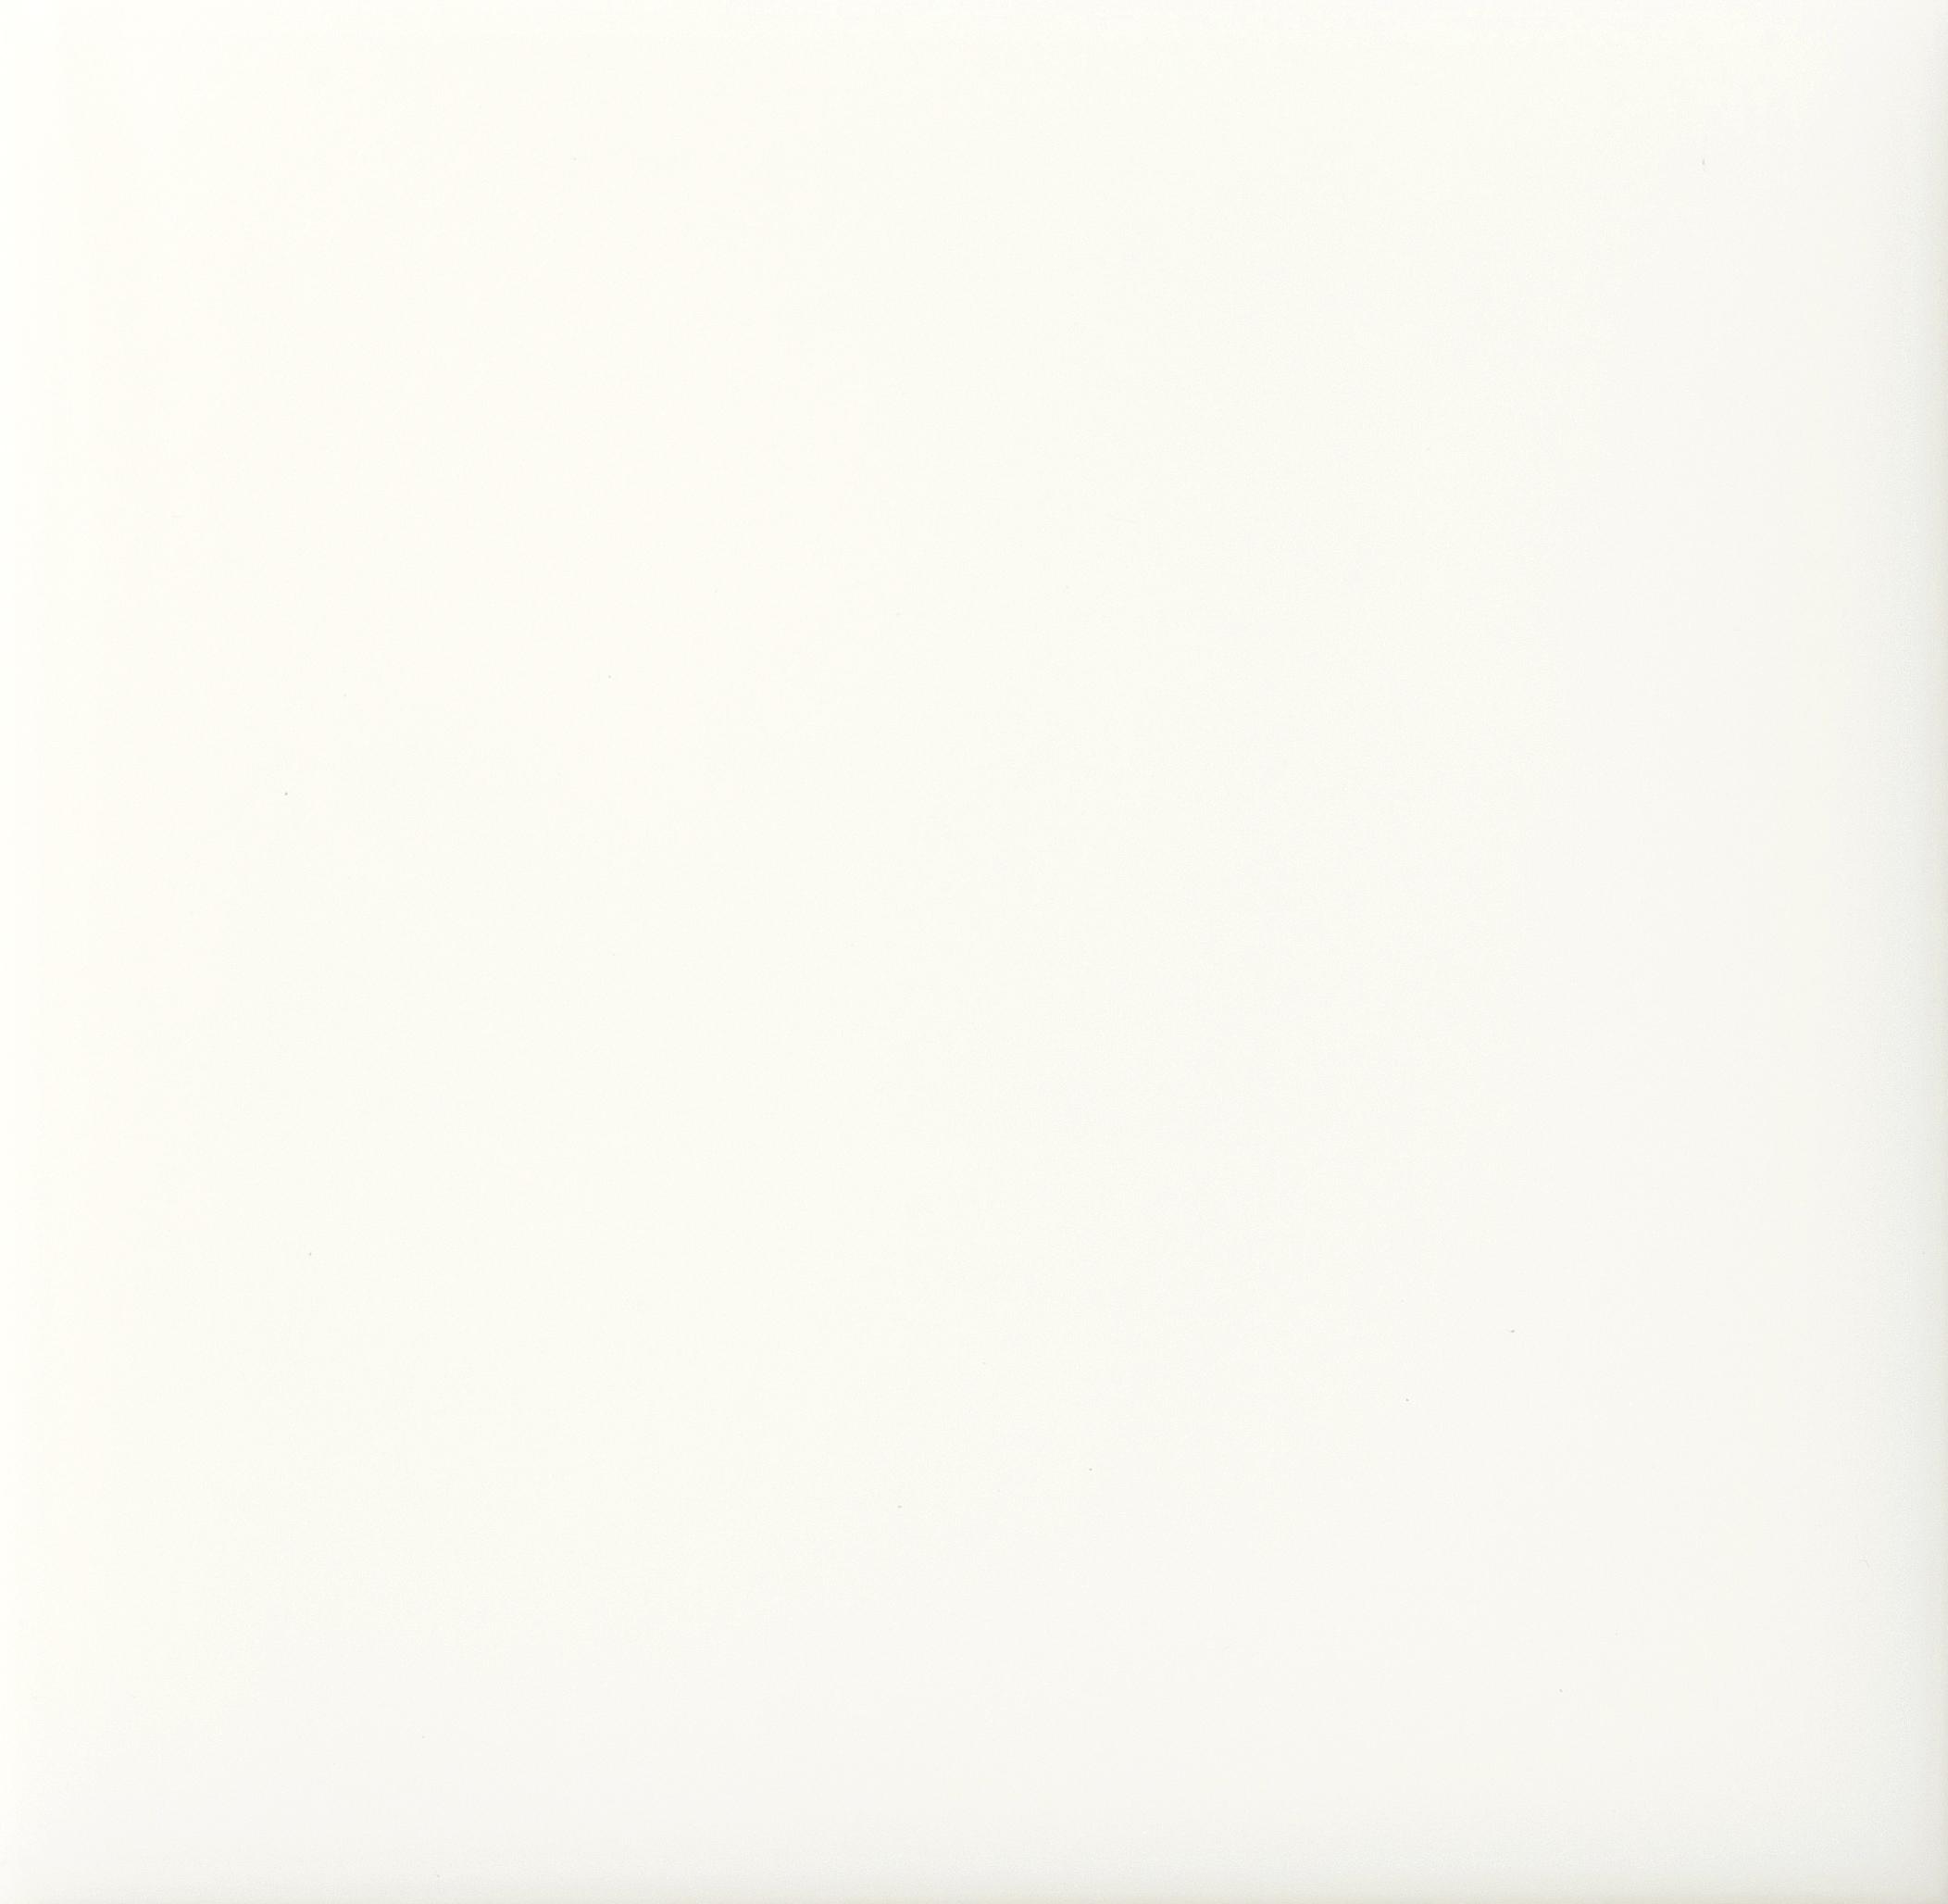 Dazzling White_SD001